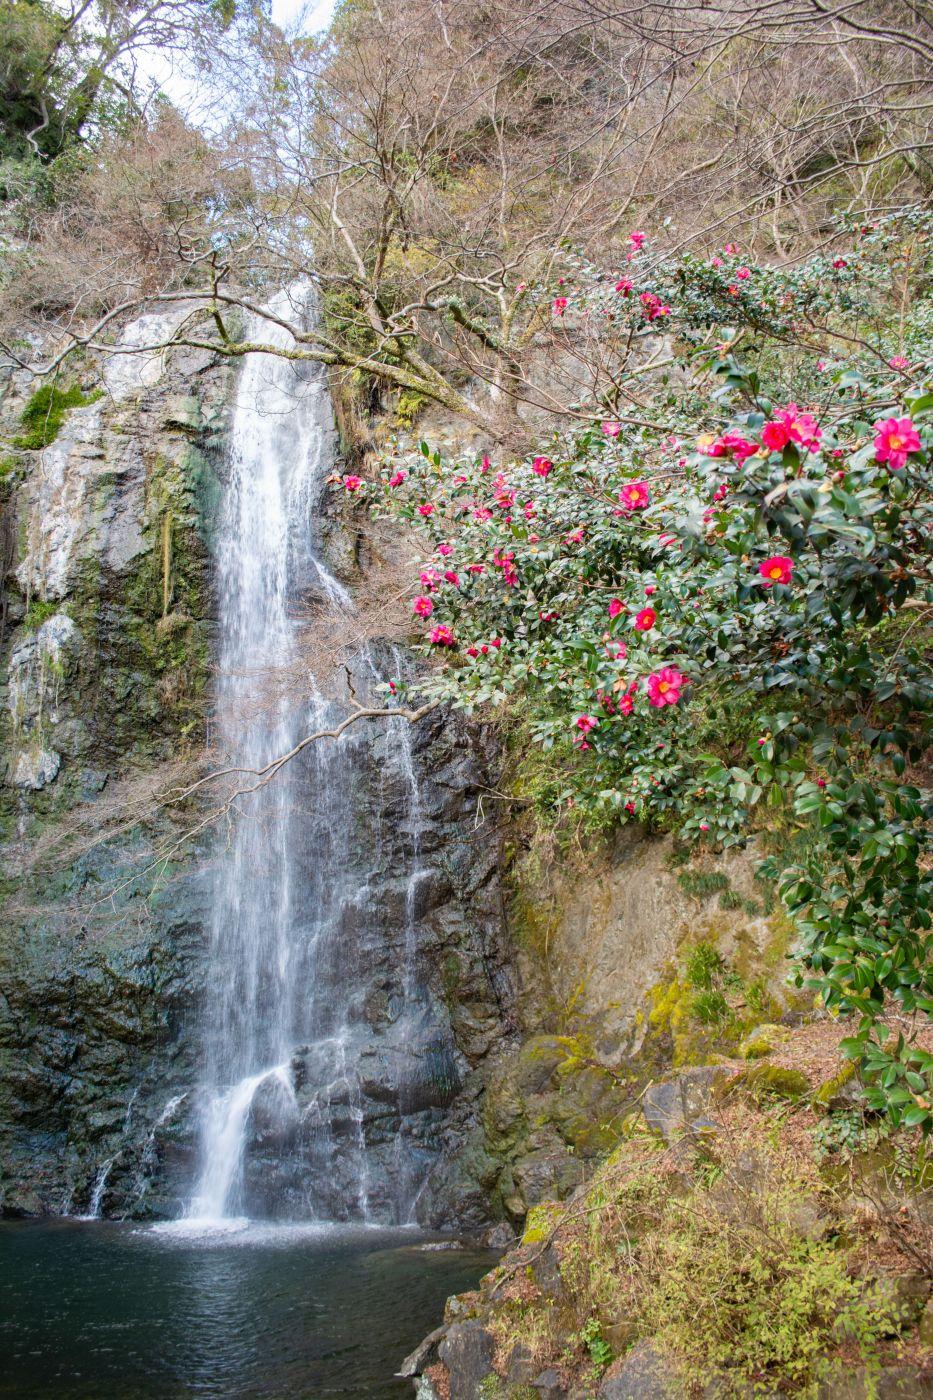 Mino Falls, Japan